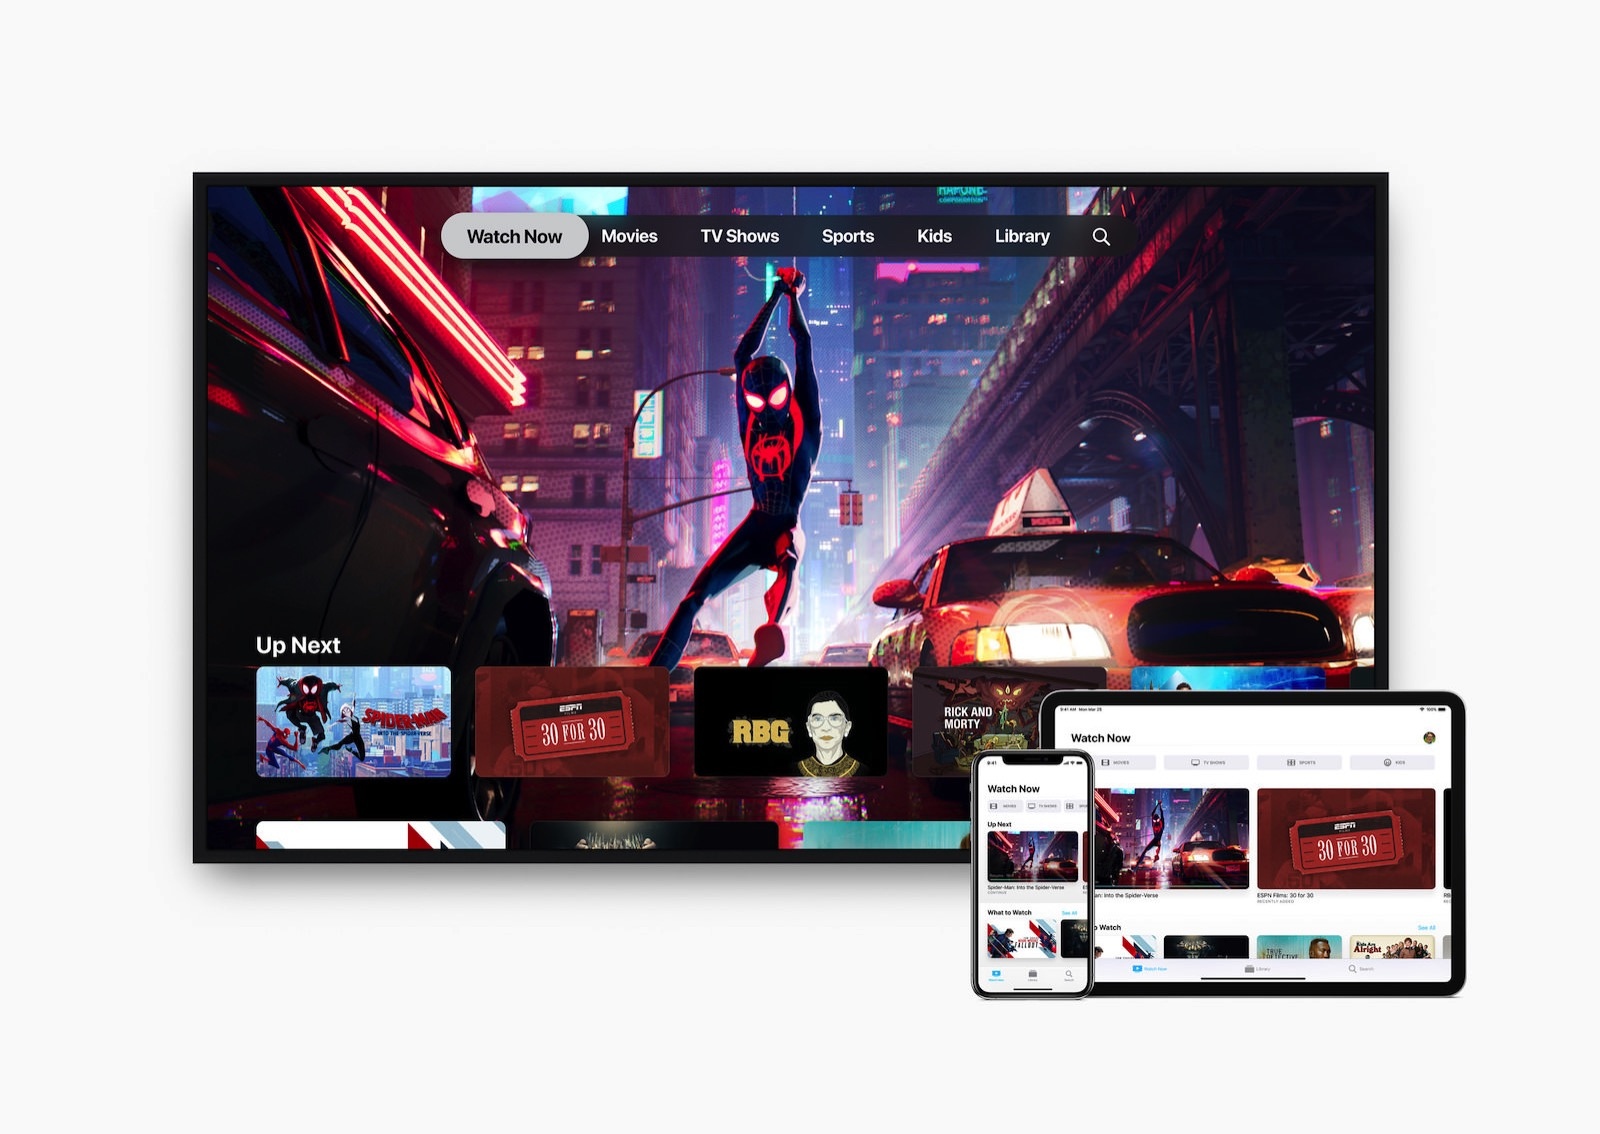 Apple-tv-ipad-pro-iphone-watch-now-screen-05132019.jpg